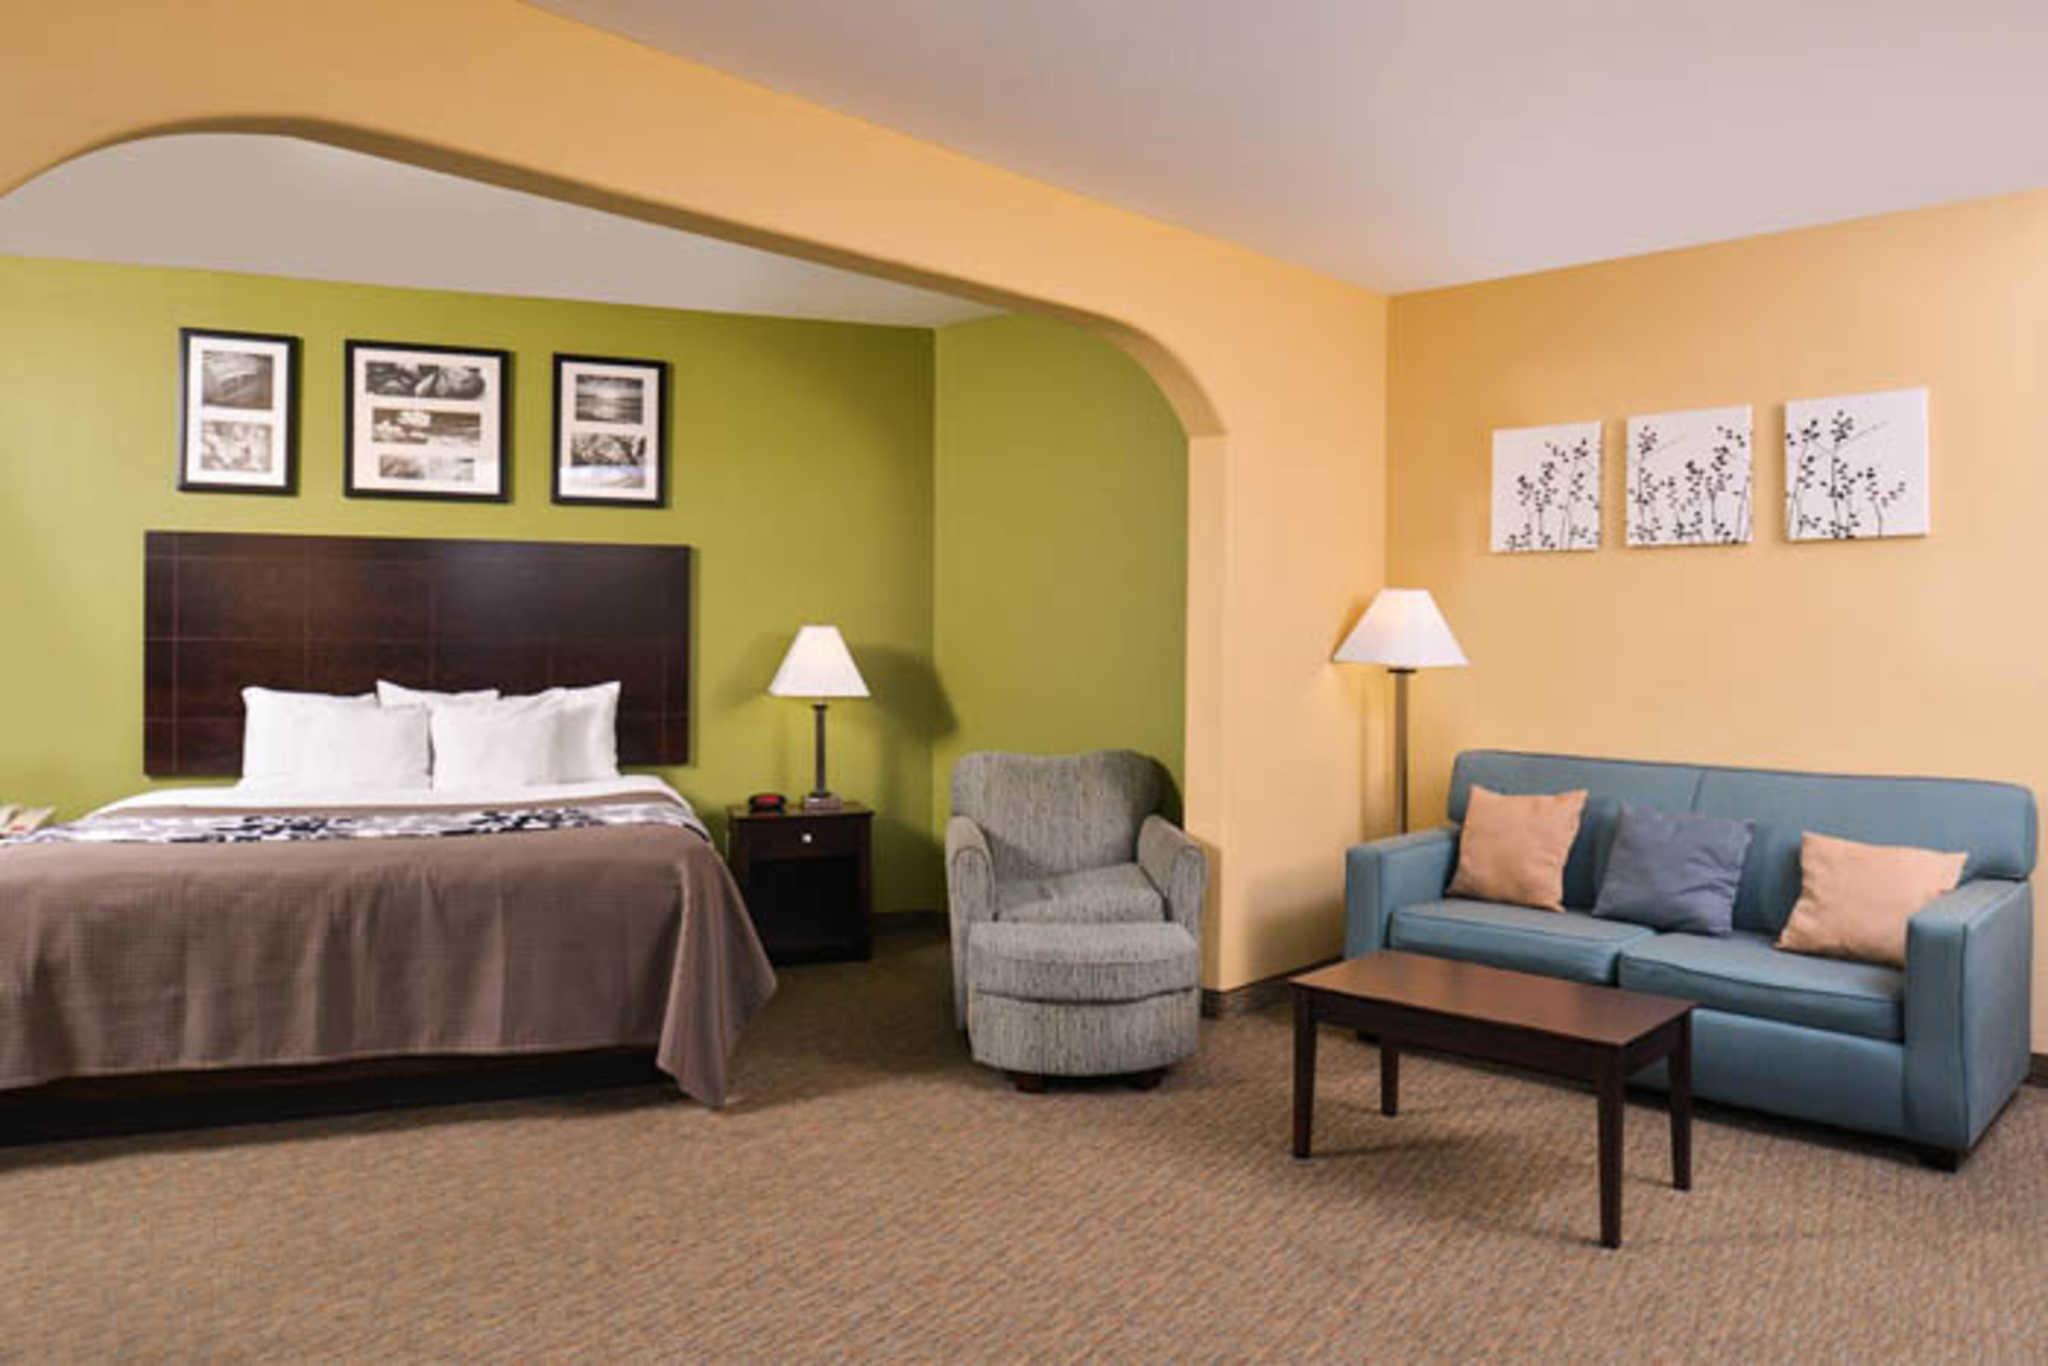 Sleep Inn & Suites Near Downtown North image 18